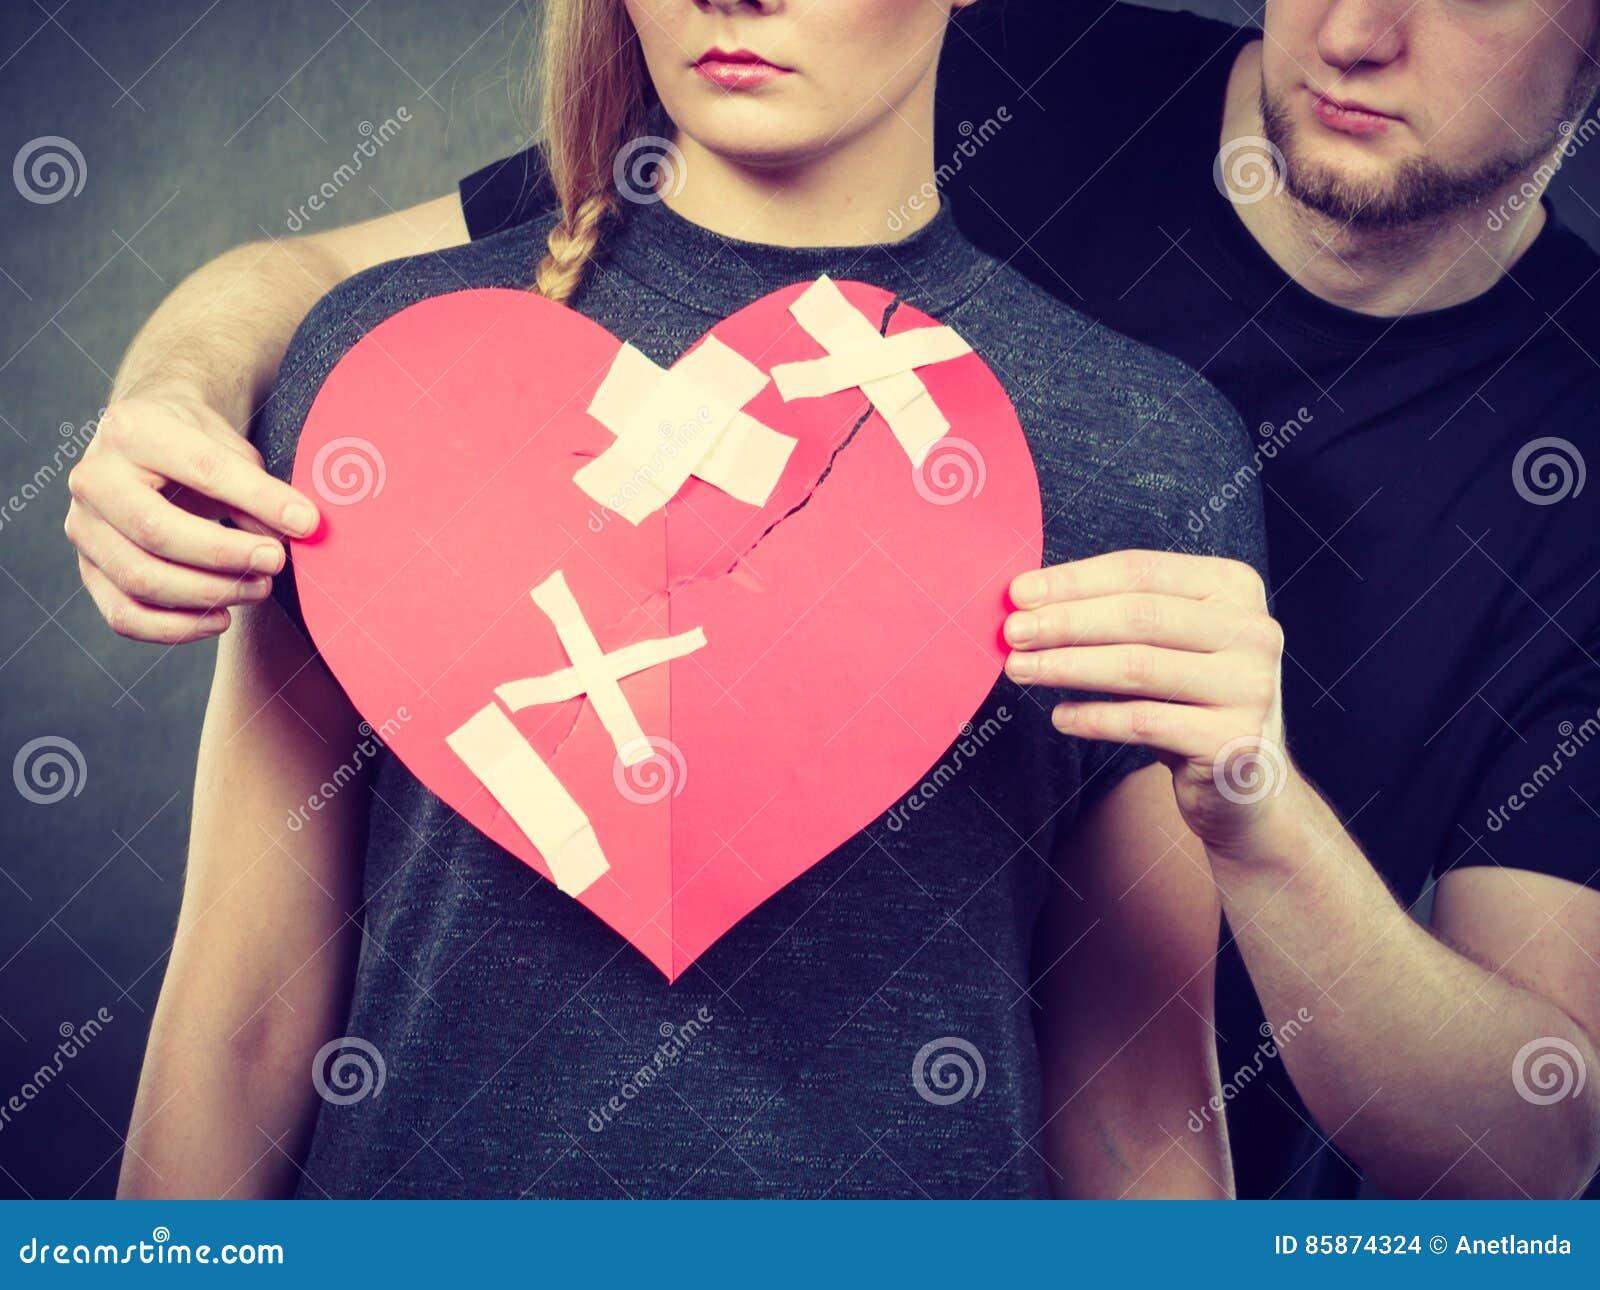 Online-Dating-okcupid-Beratung